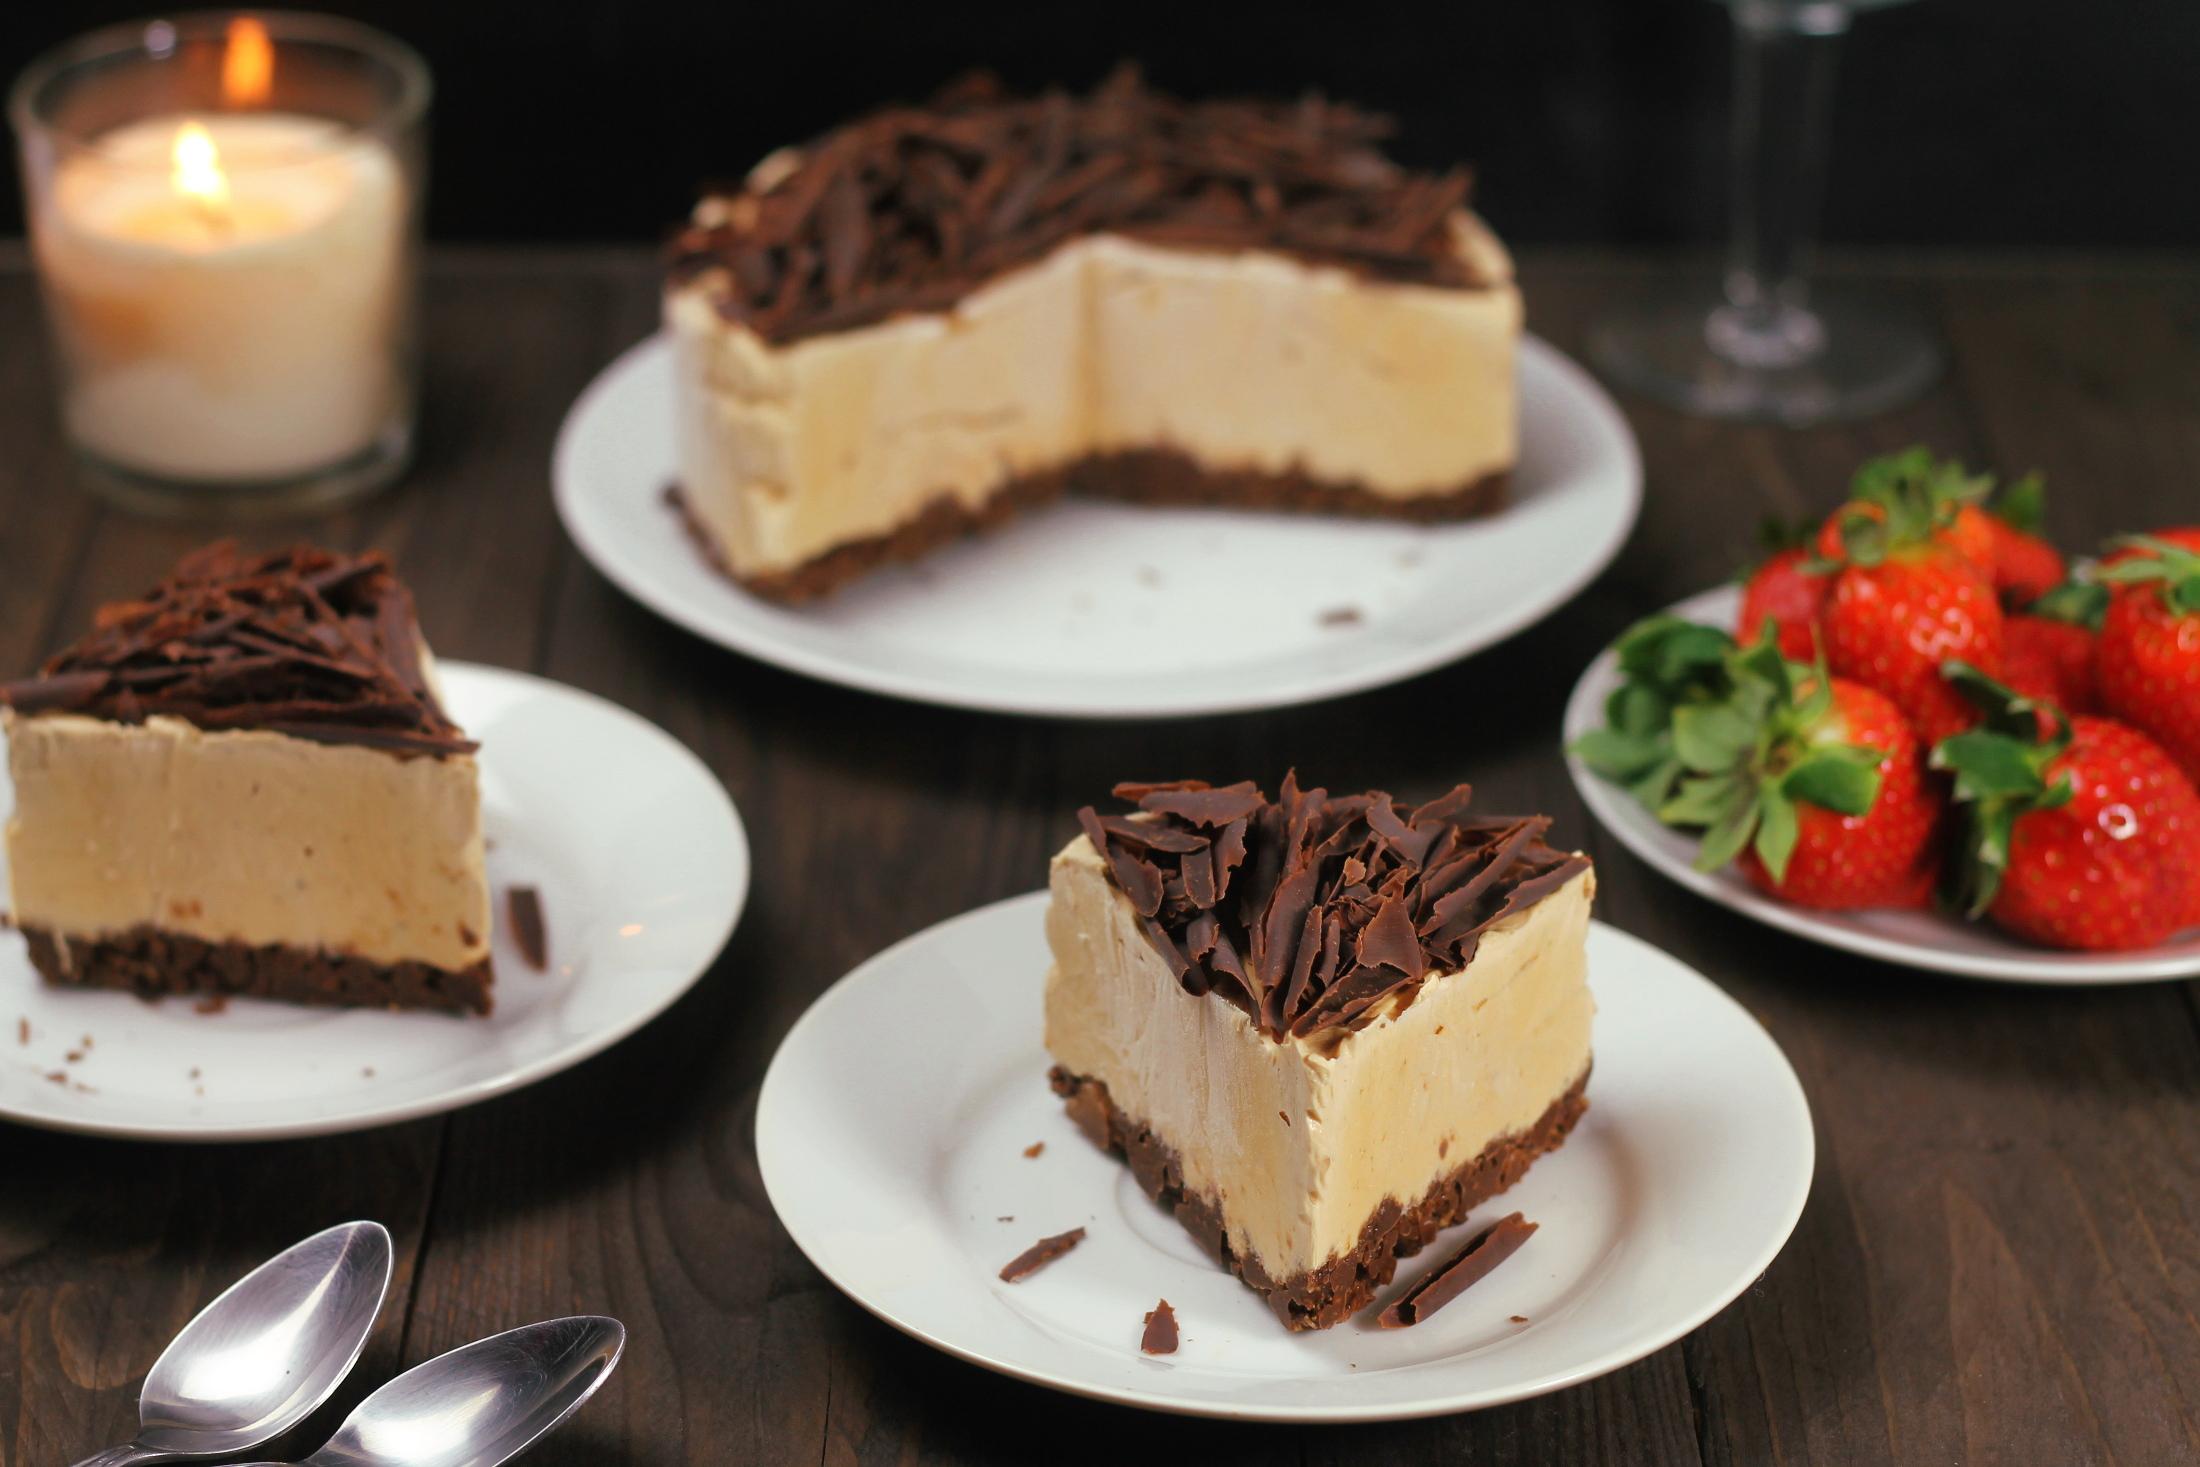 mrazeny-bananovy-cheesecake-dulce-de-leche-6